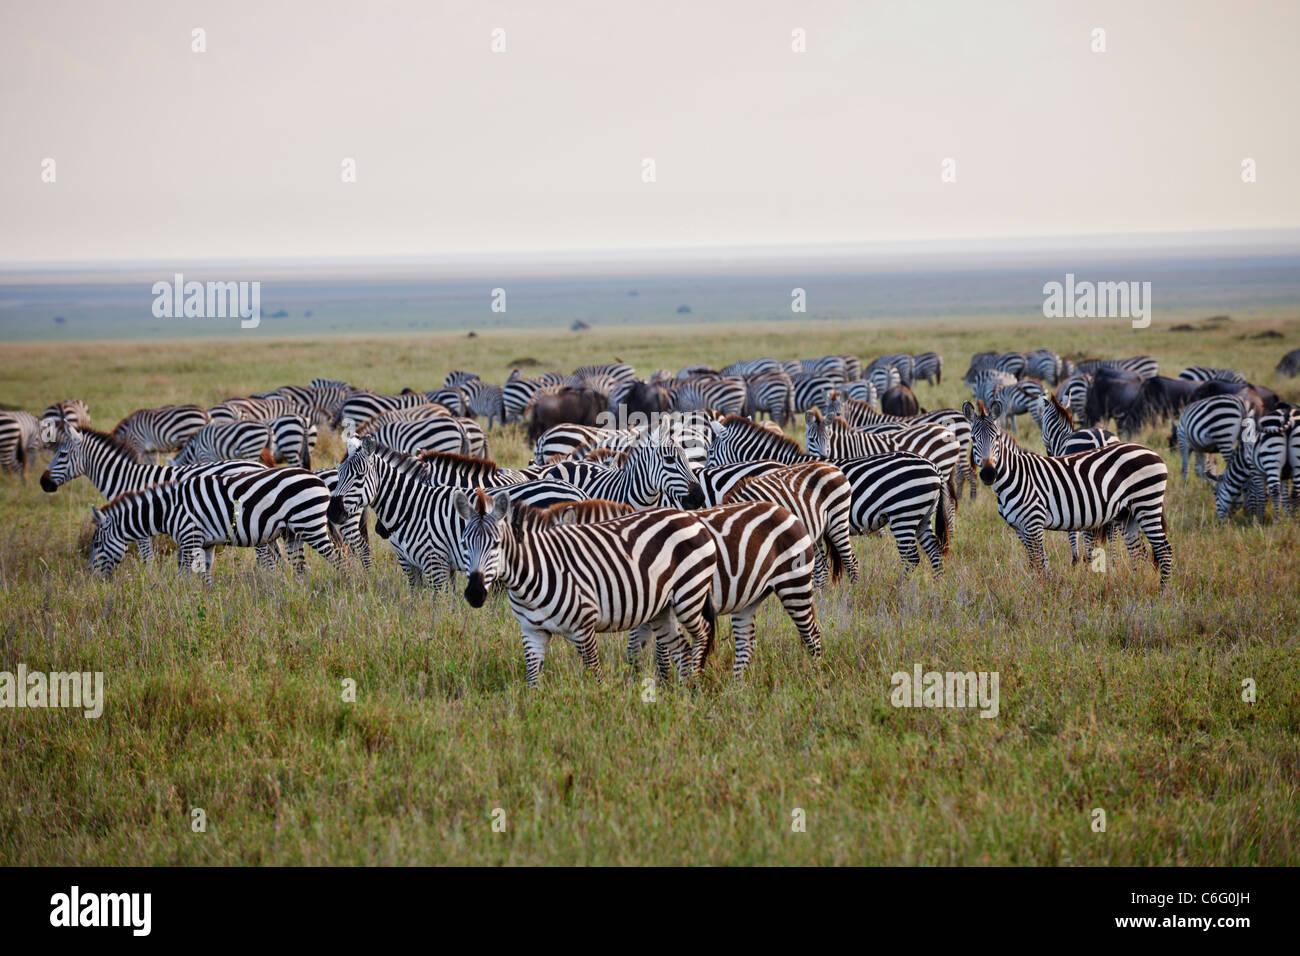 Plains Zebra on migration, Equus quagga, Serengeti, Tanzania, Africa - Stock Image